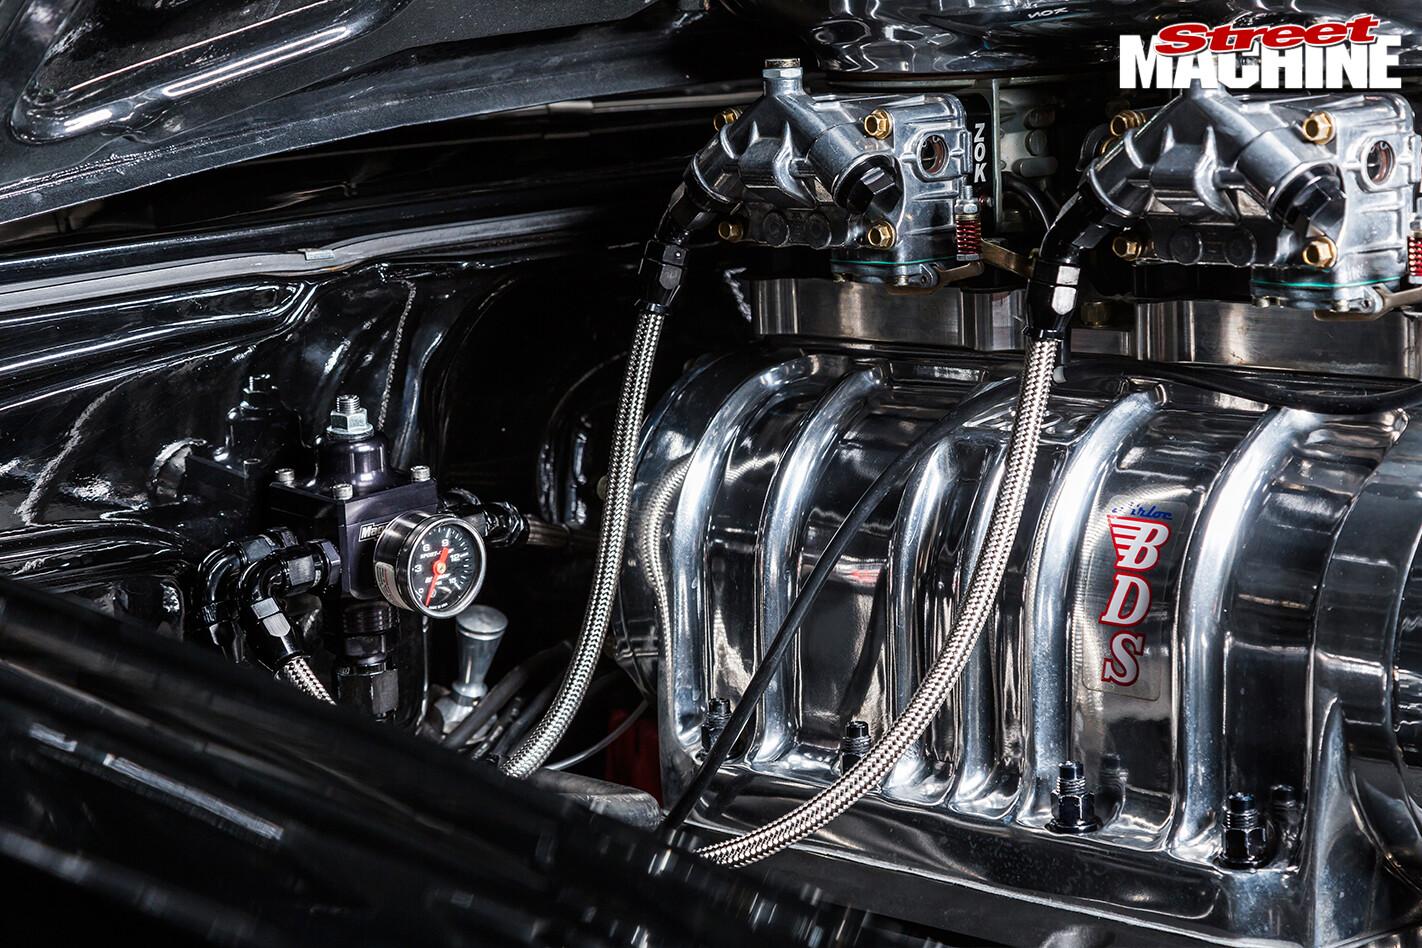 1957-Chevrolet -engine -detail